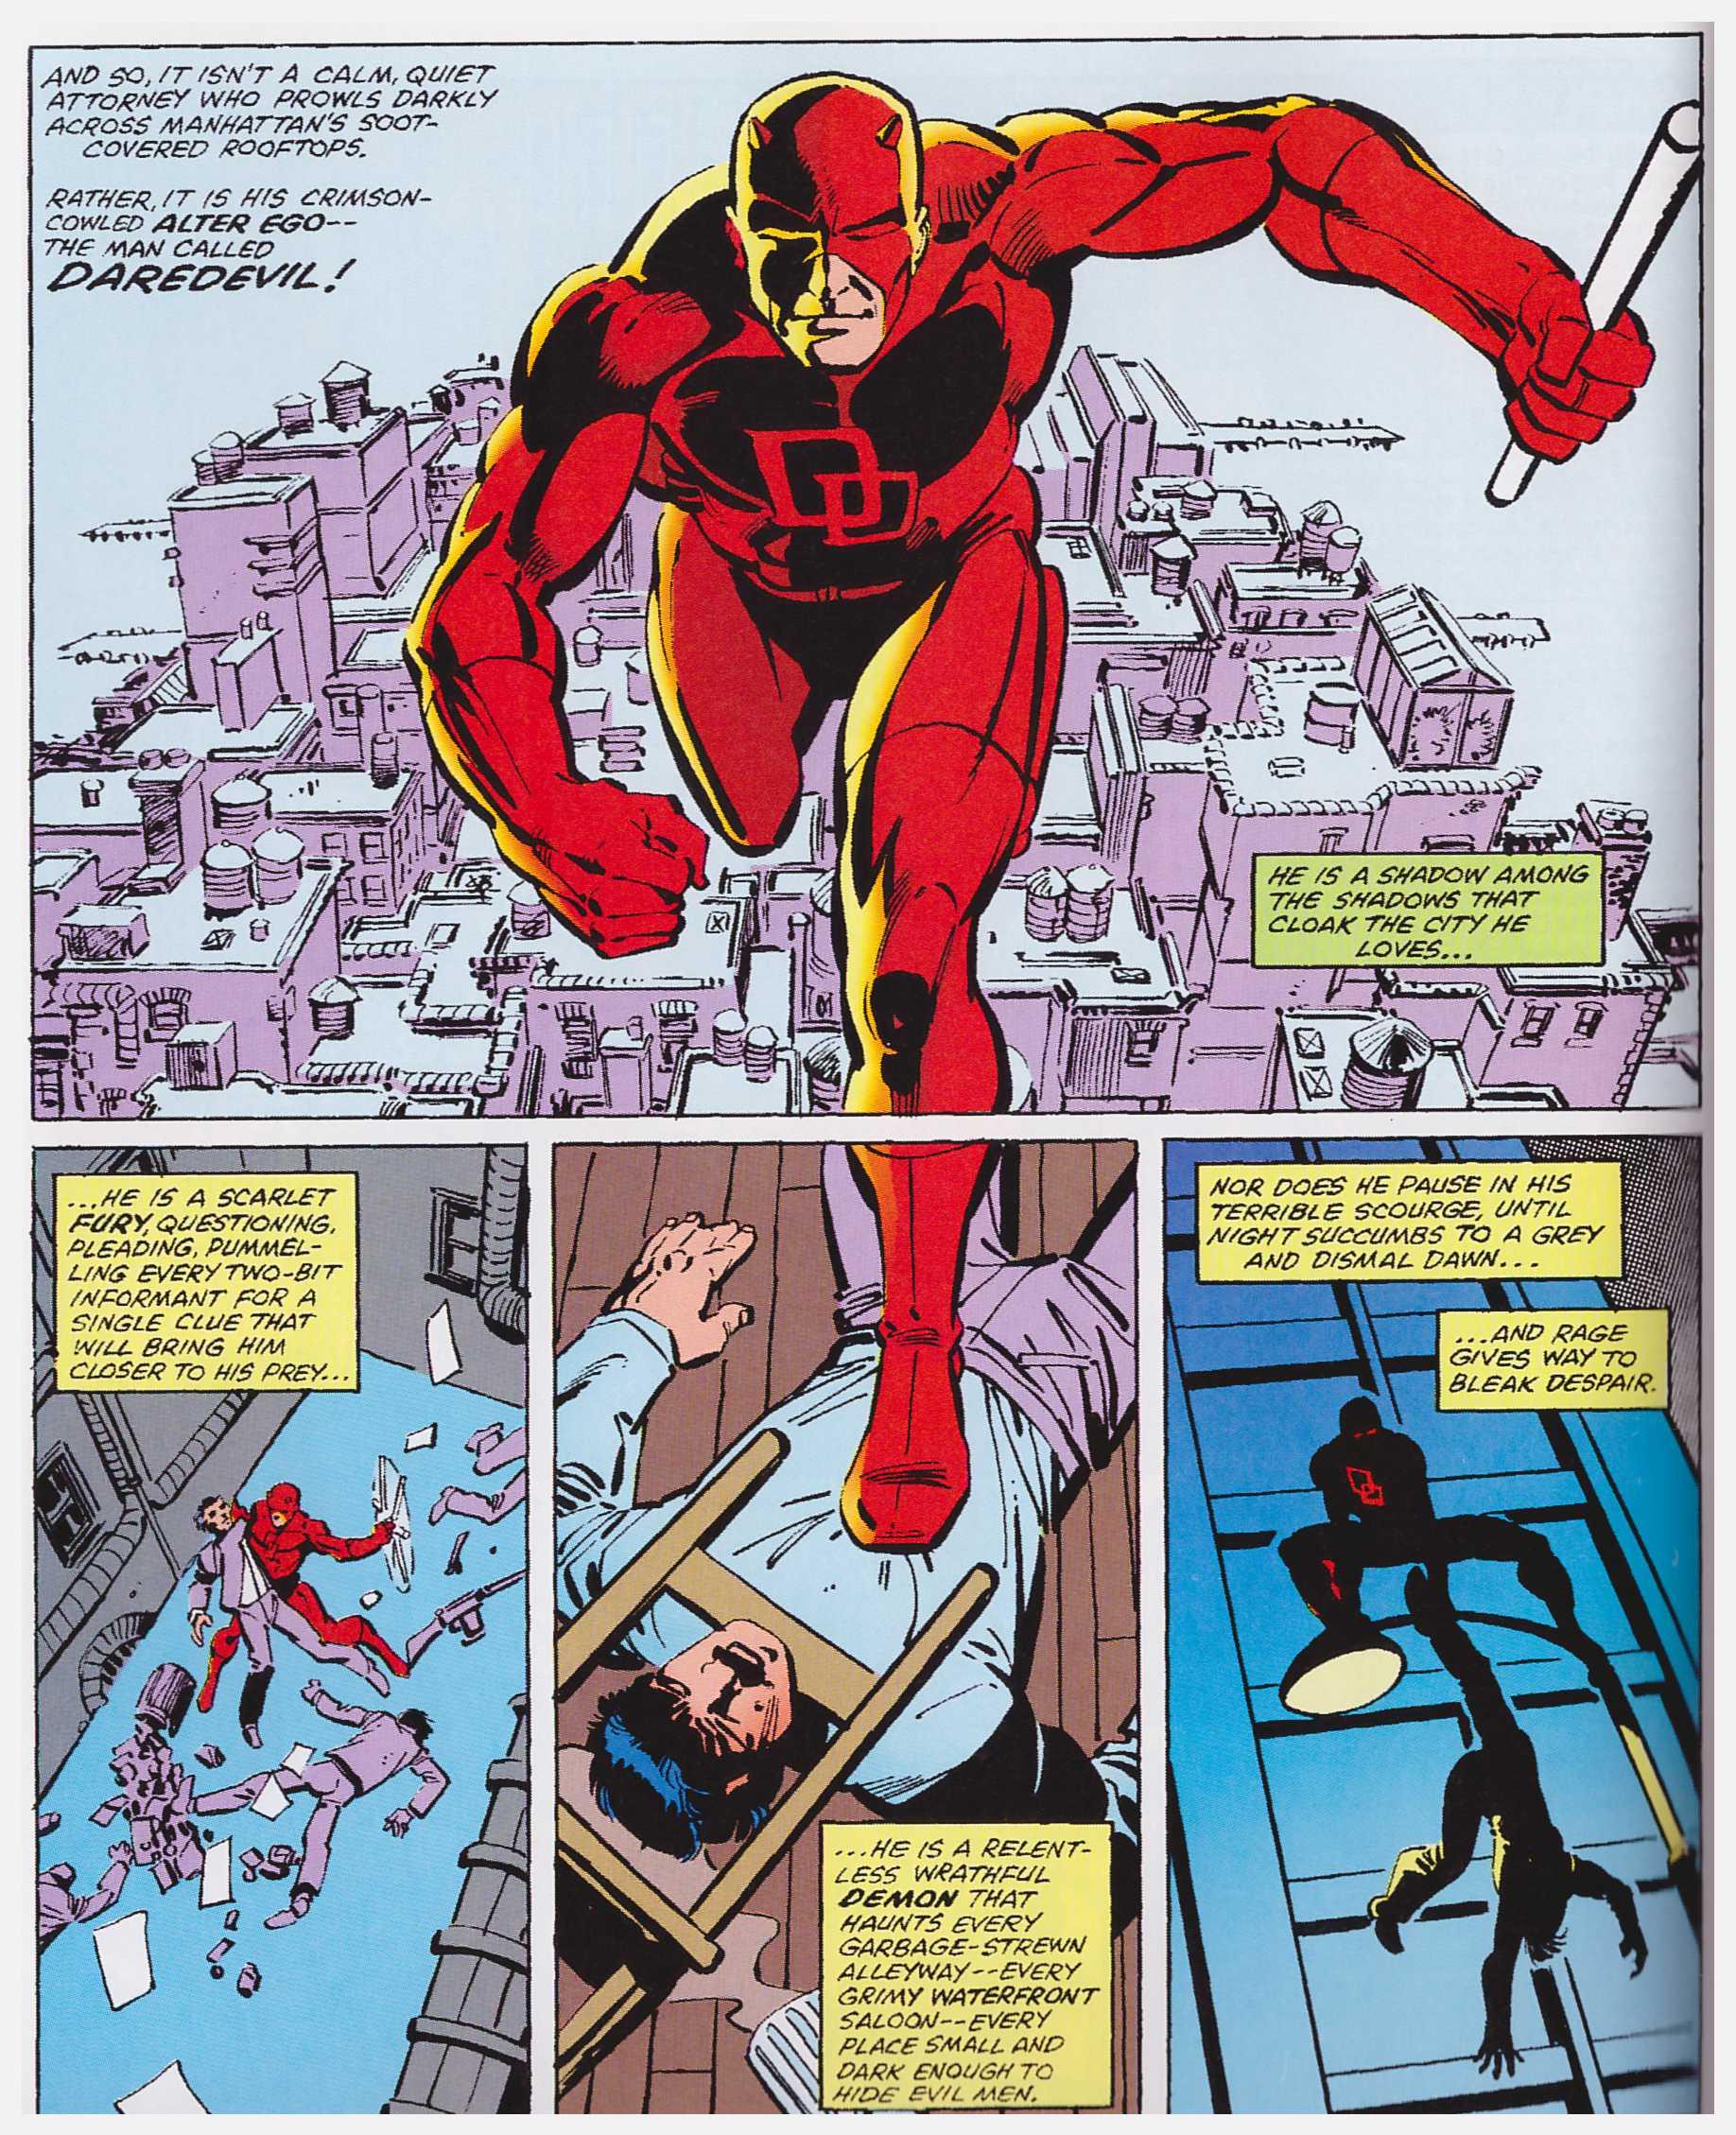 Daredevil by Frank Miller & Klaus Janson volume 2 review